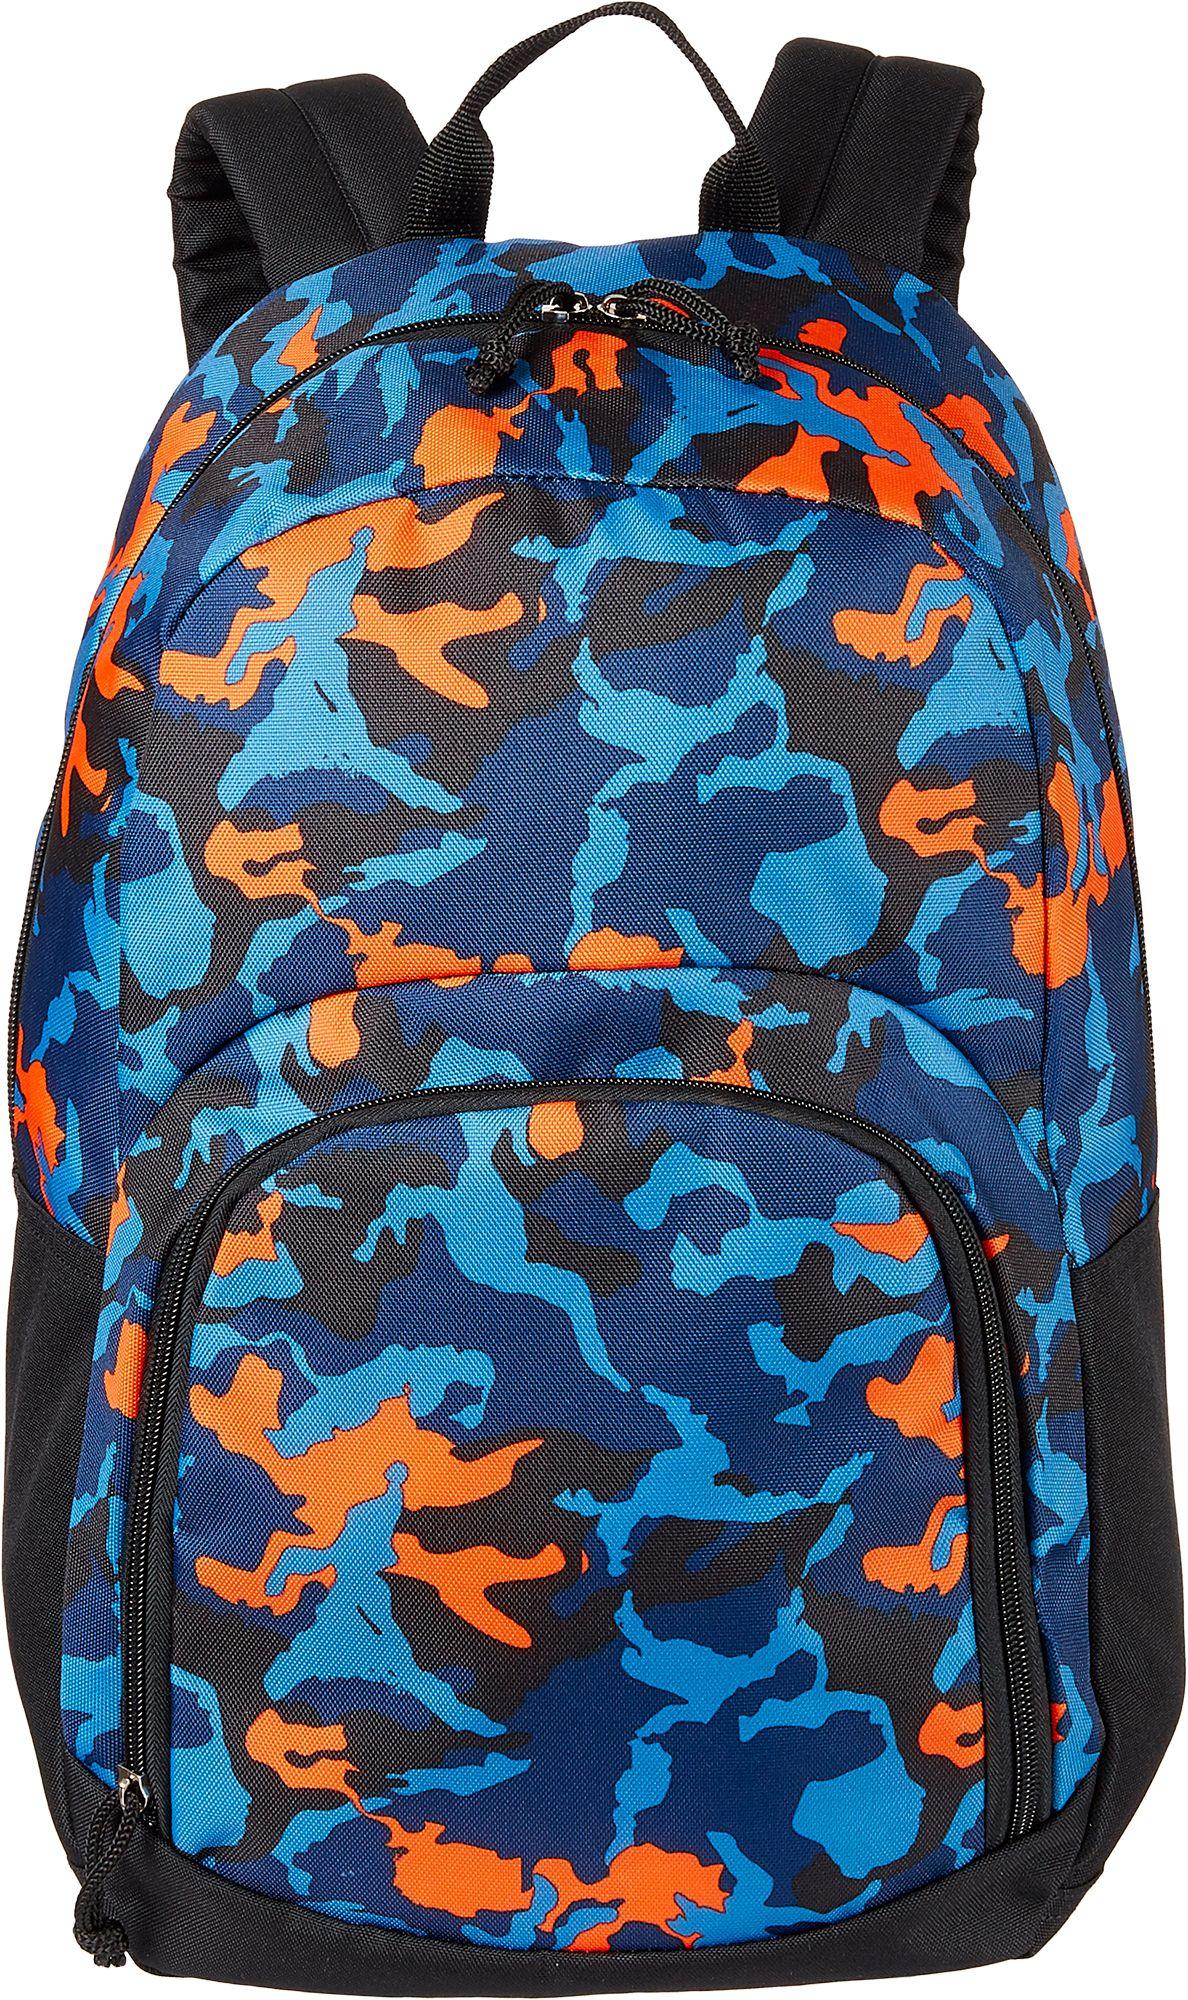 DSG Adventure Backpack, Camo/Black/Blue/Orange